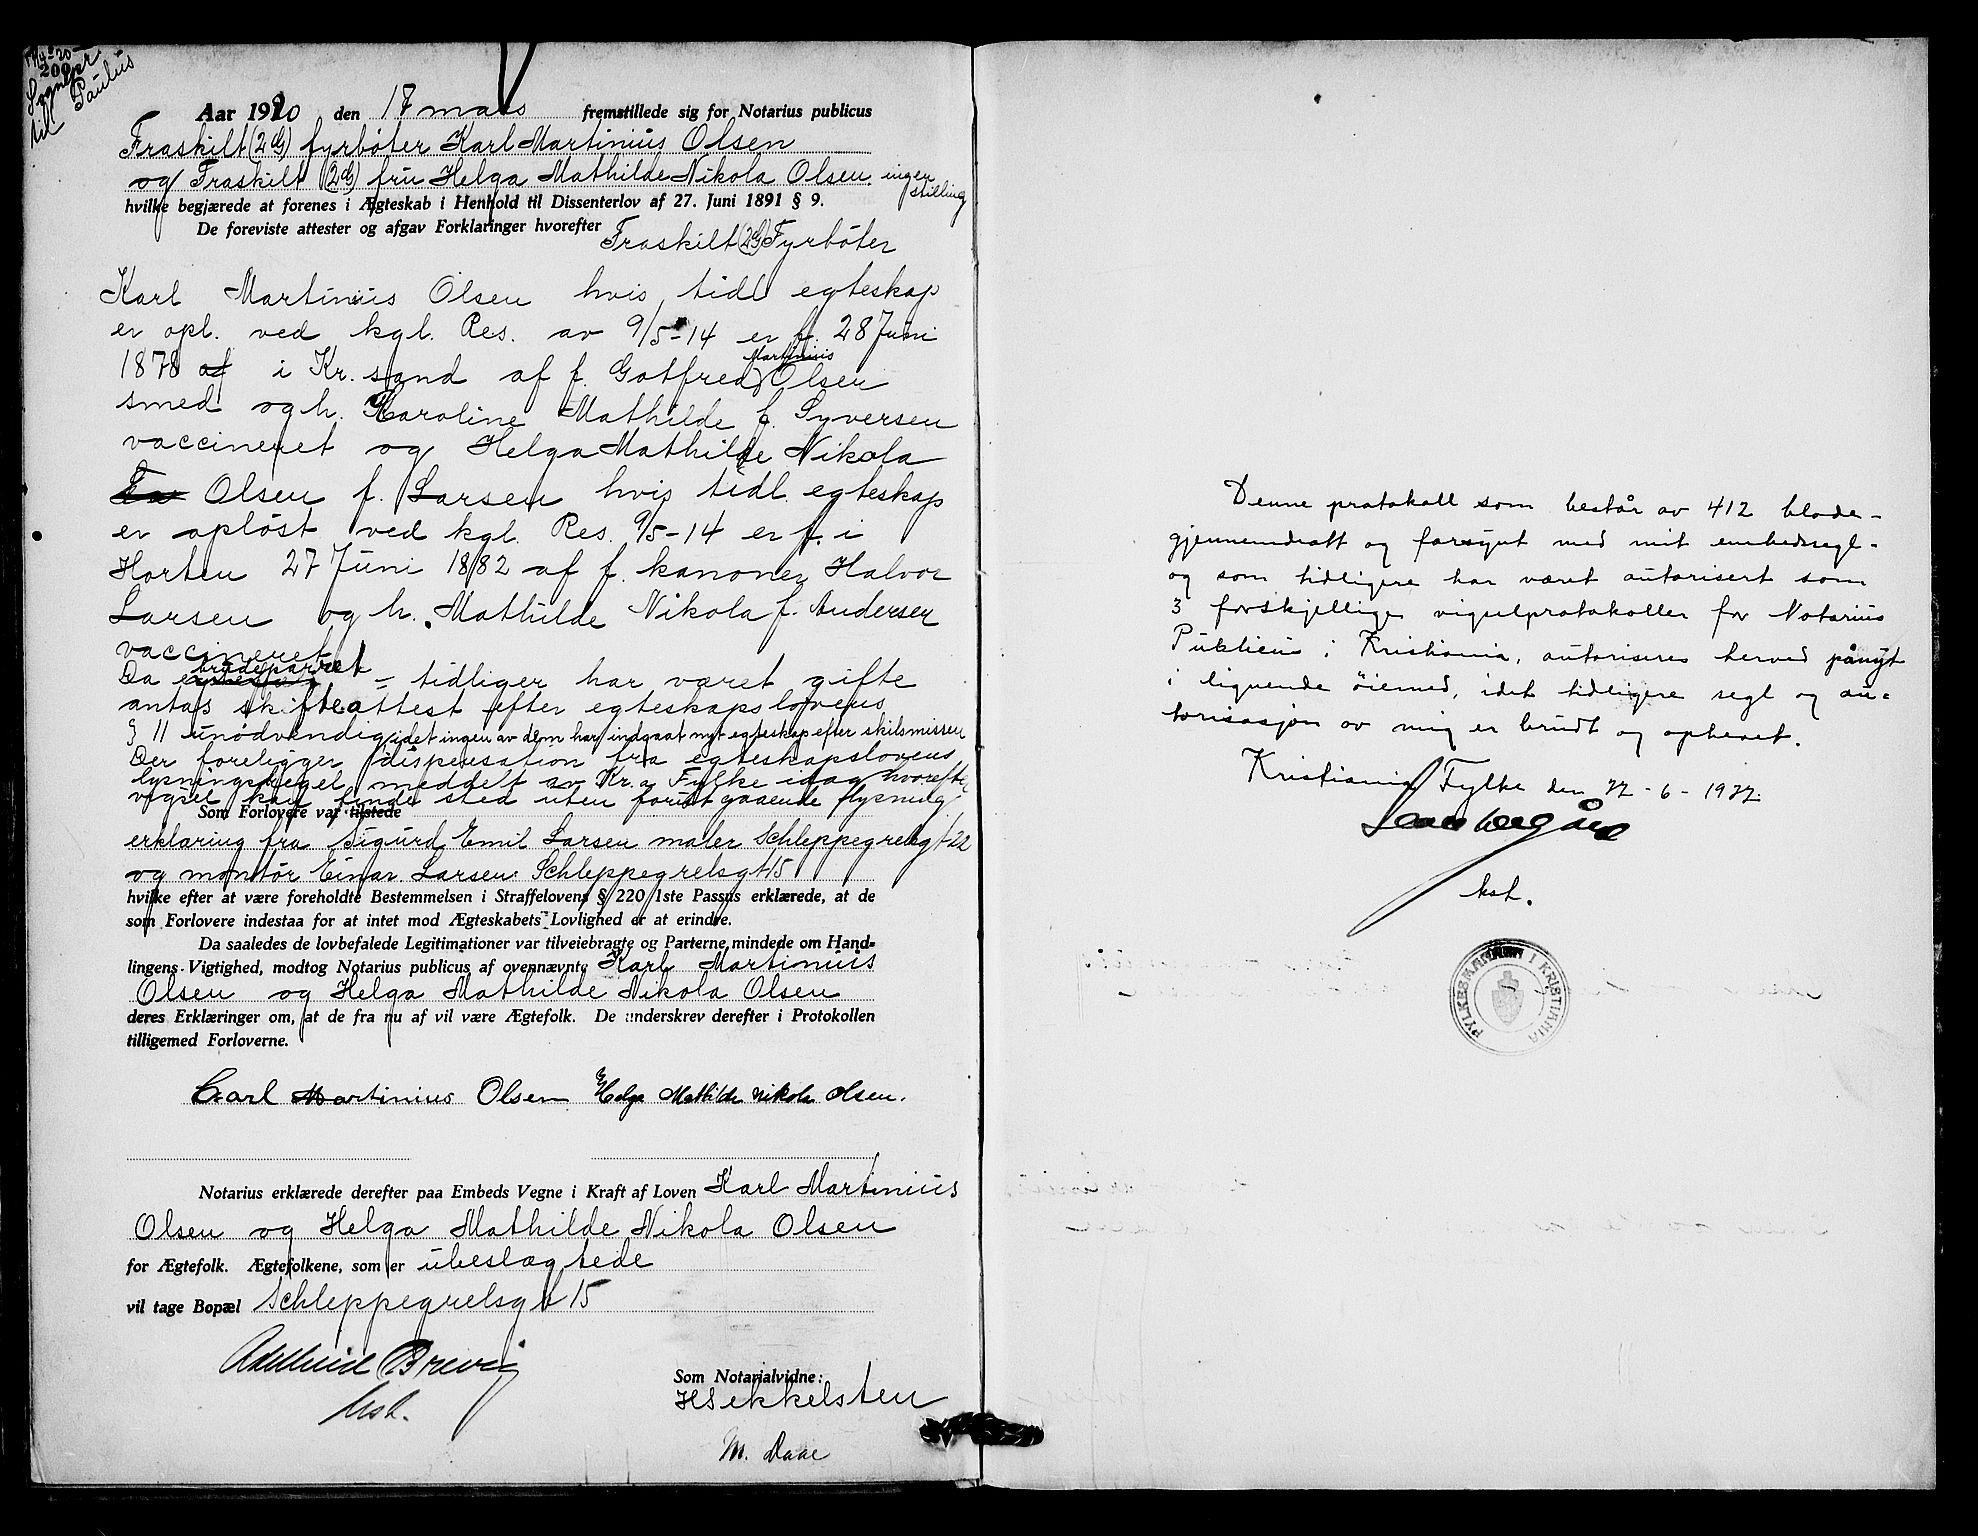 SAO, Oslo byfogd avd. I, L/Lb/Lbb/L0013: Notarialprotokoll, rekke II: Vigsler, 1919-1920, s. 200